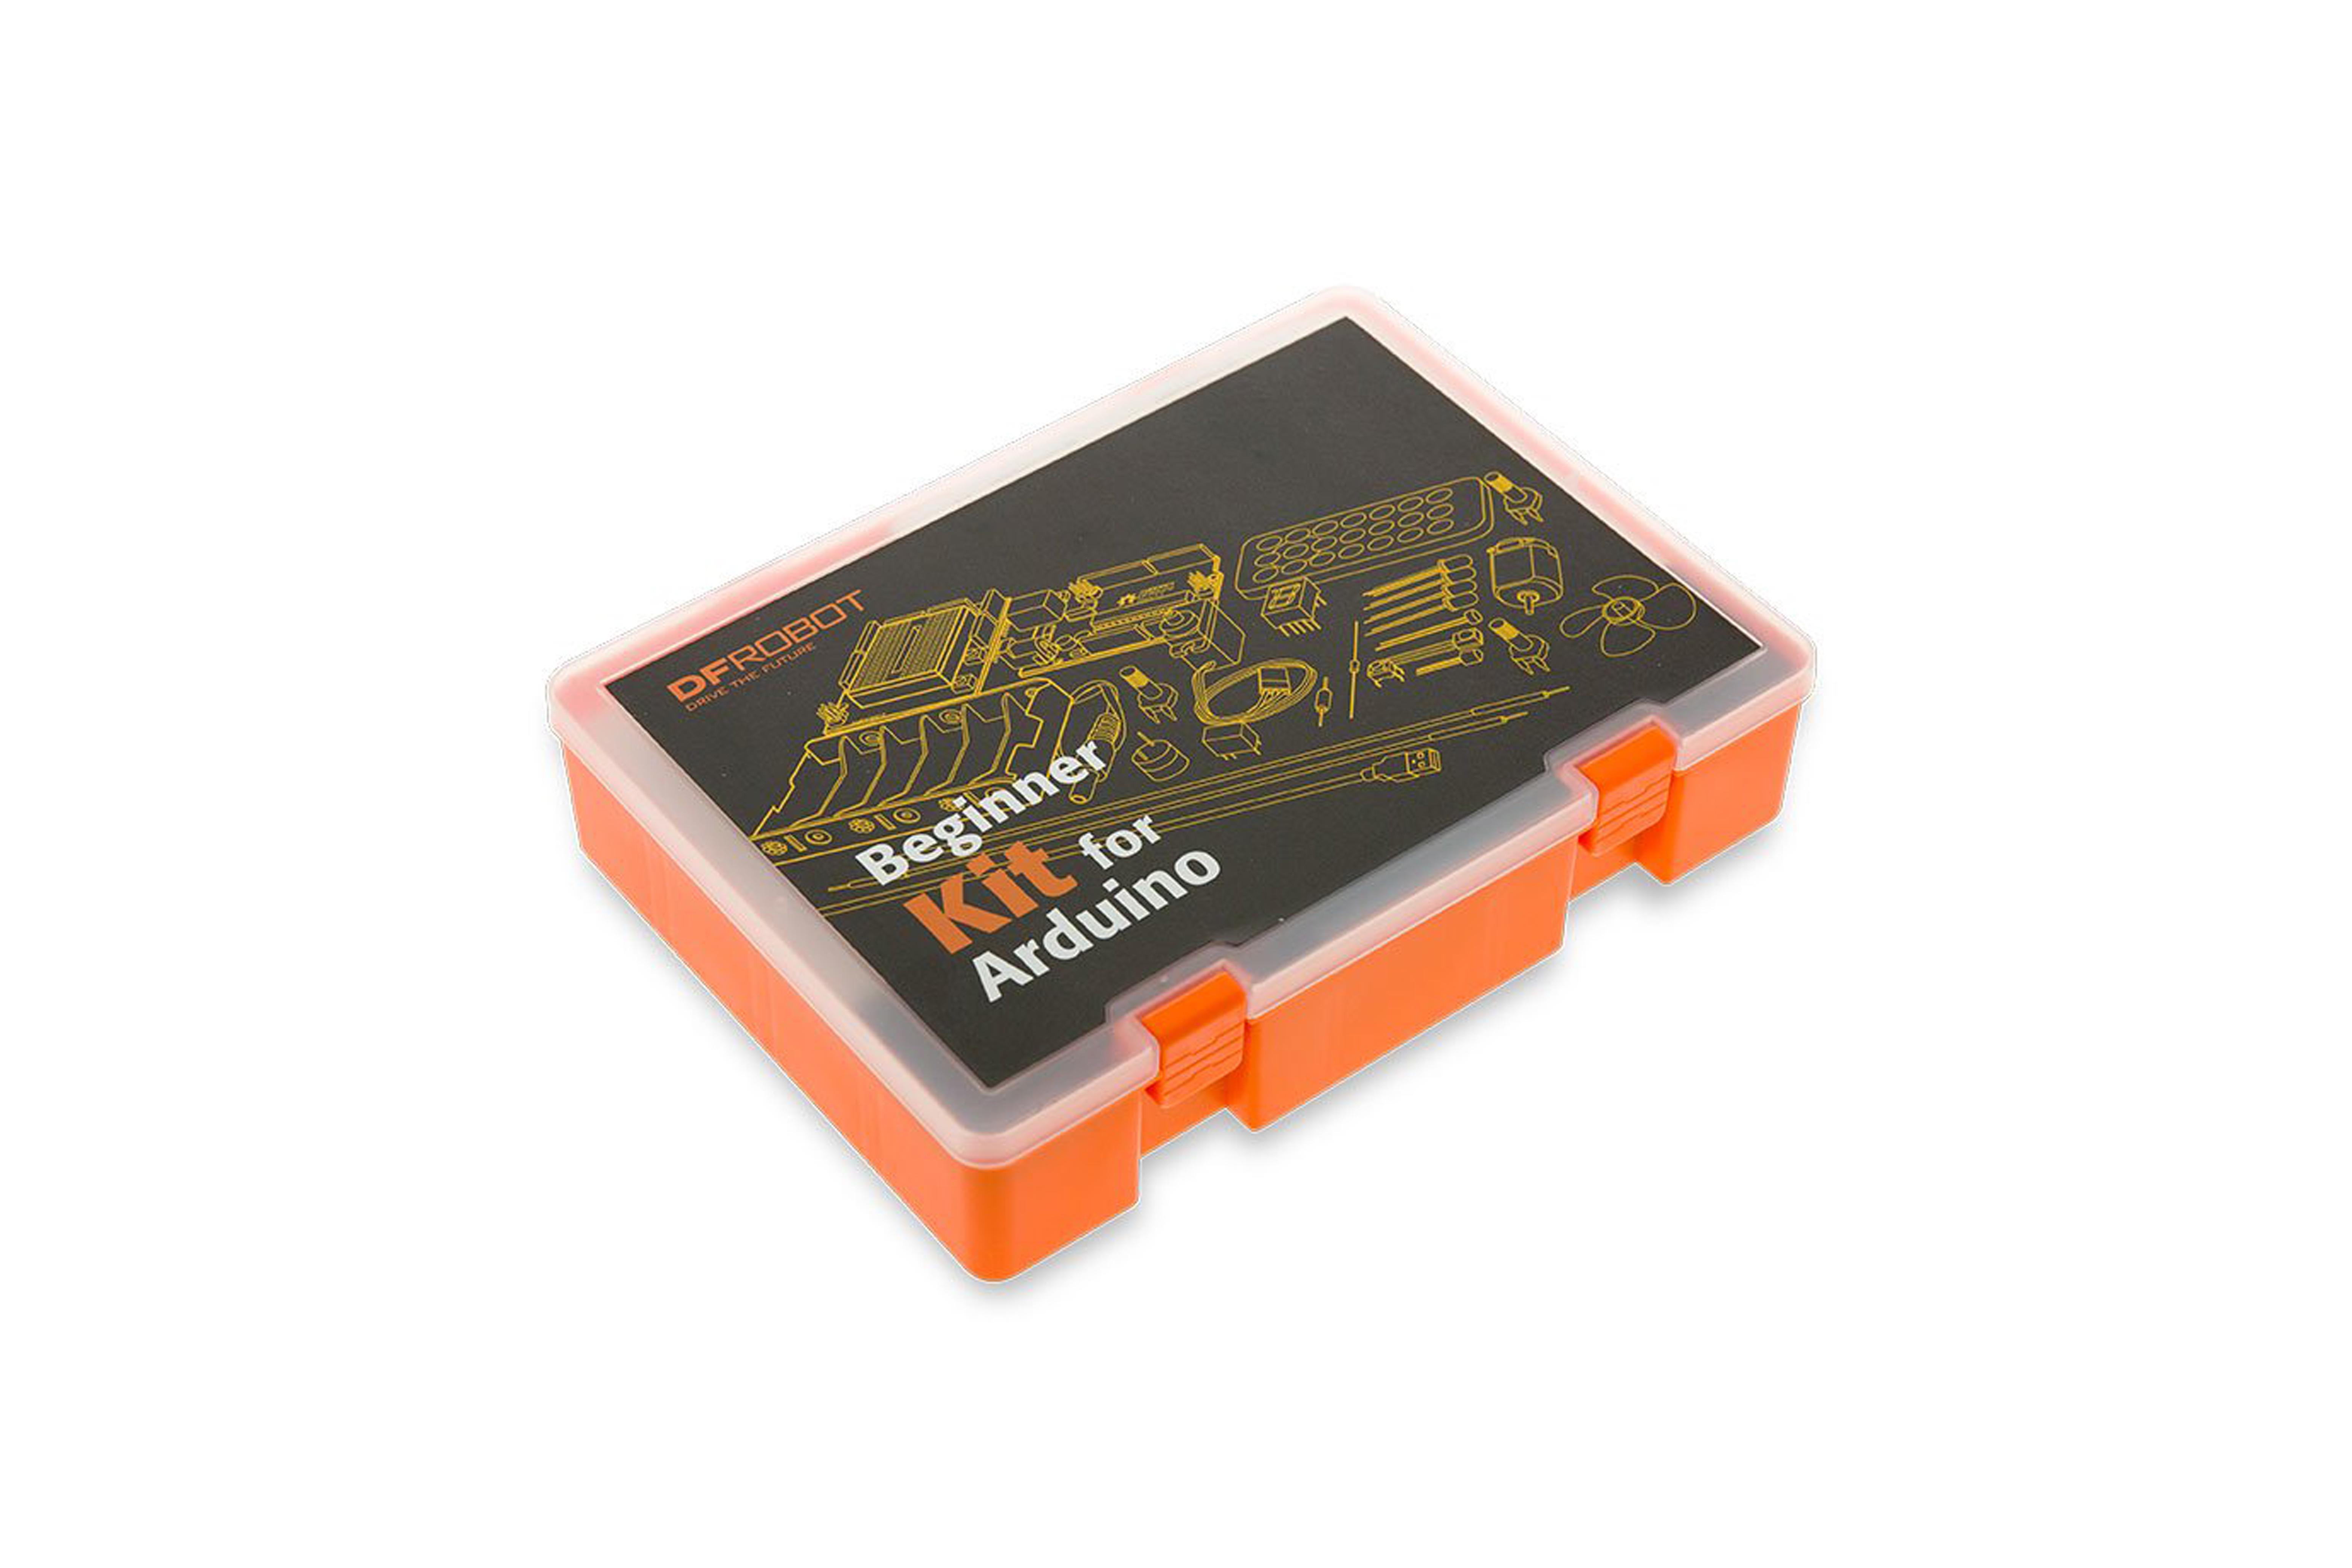 Kit débutant Arduino inc DFRduino Uno R3